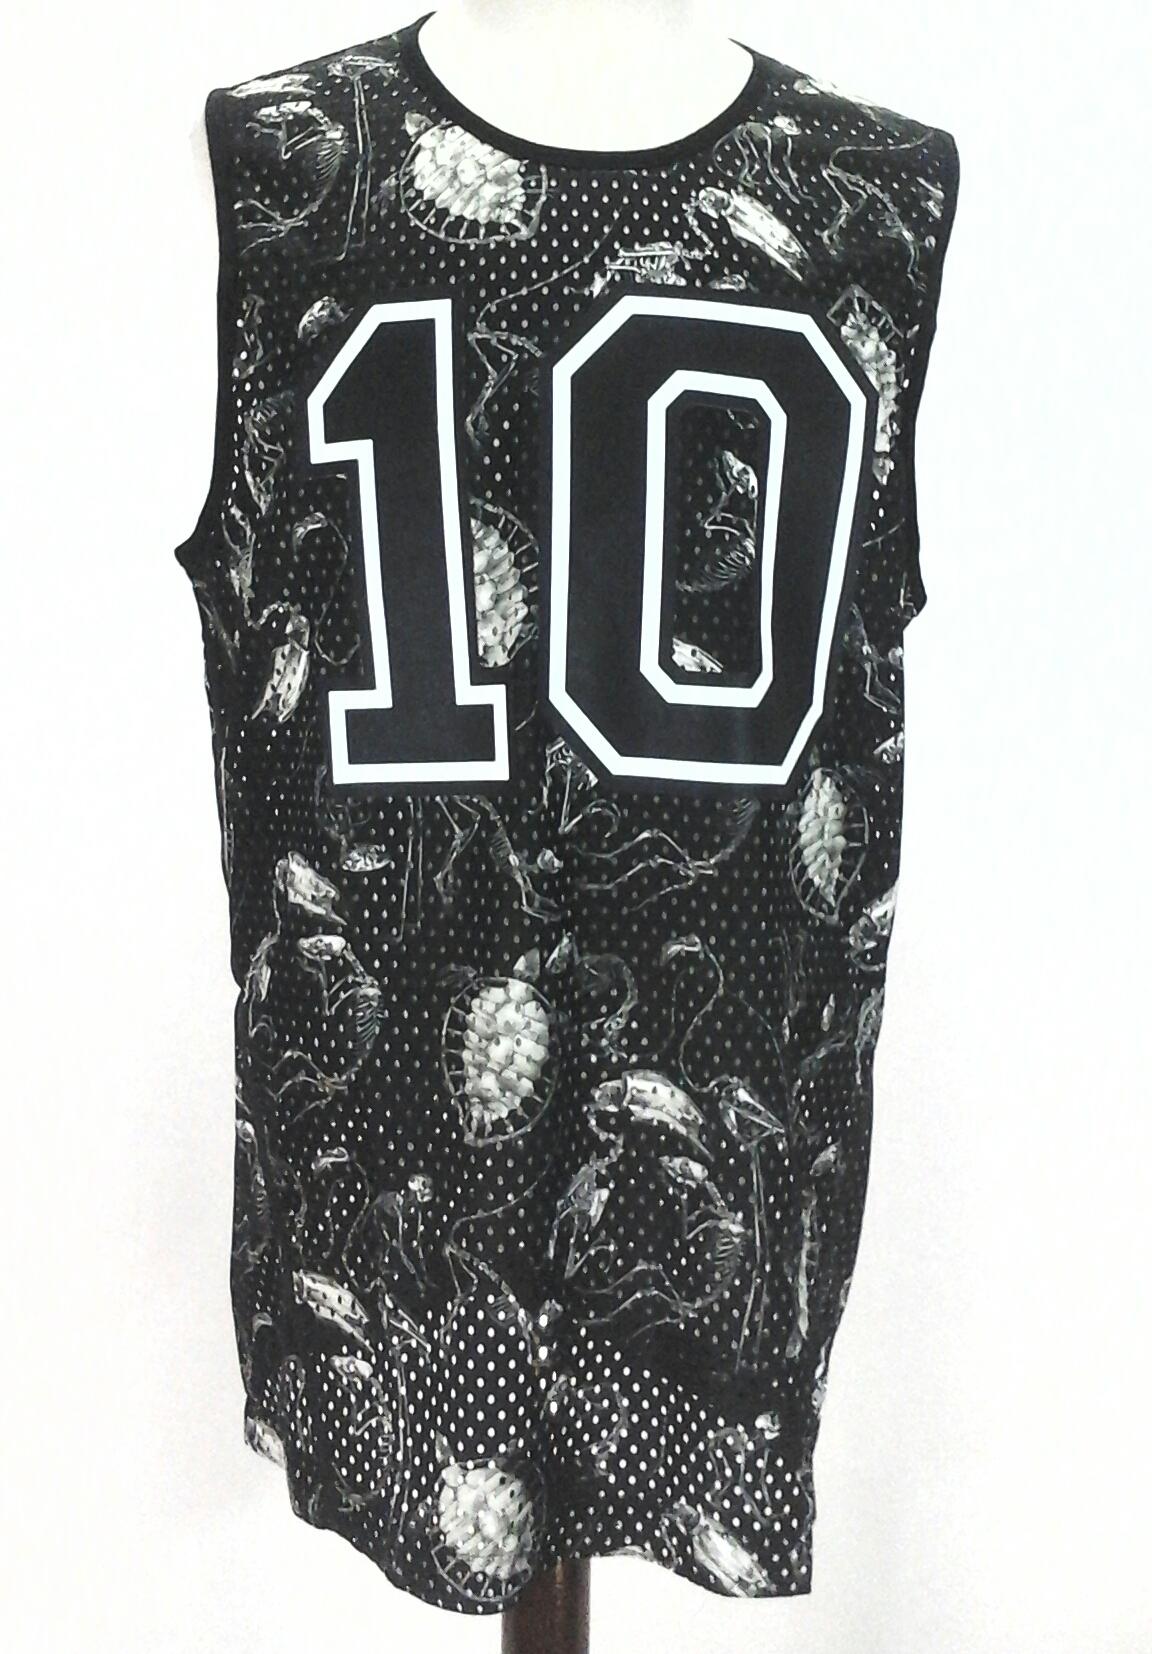 9ff99f107688 Puma TT5154 Men s Swash London Basketball Tank Top Black Ossuray Relic M   L